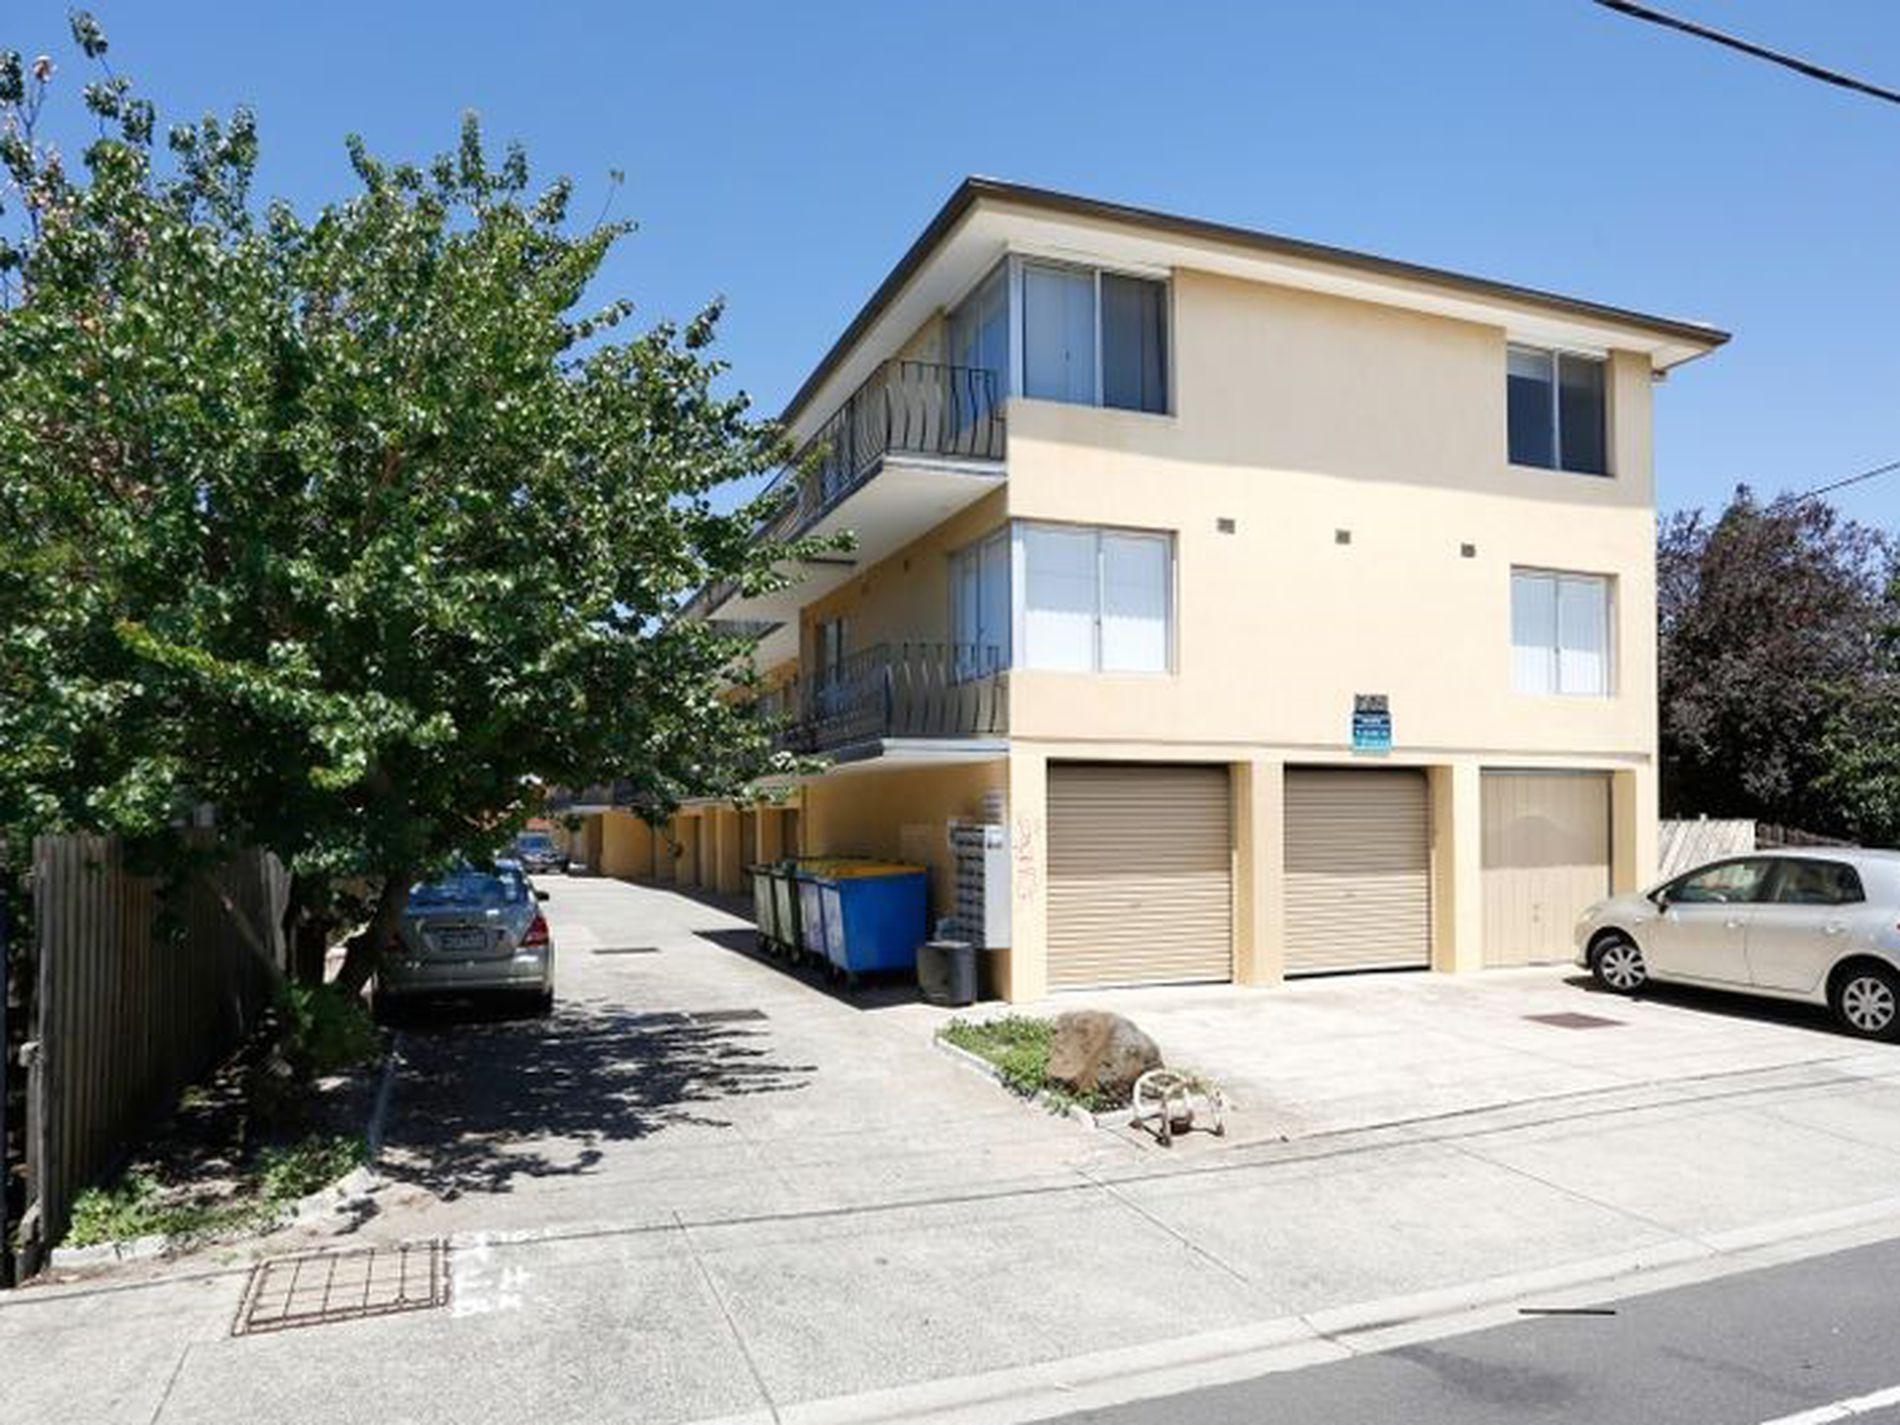 13/709 Barkly Street, West Footscray